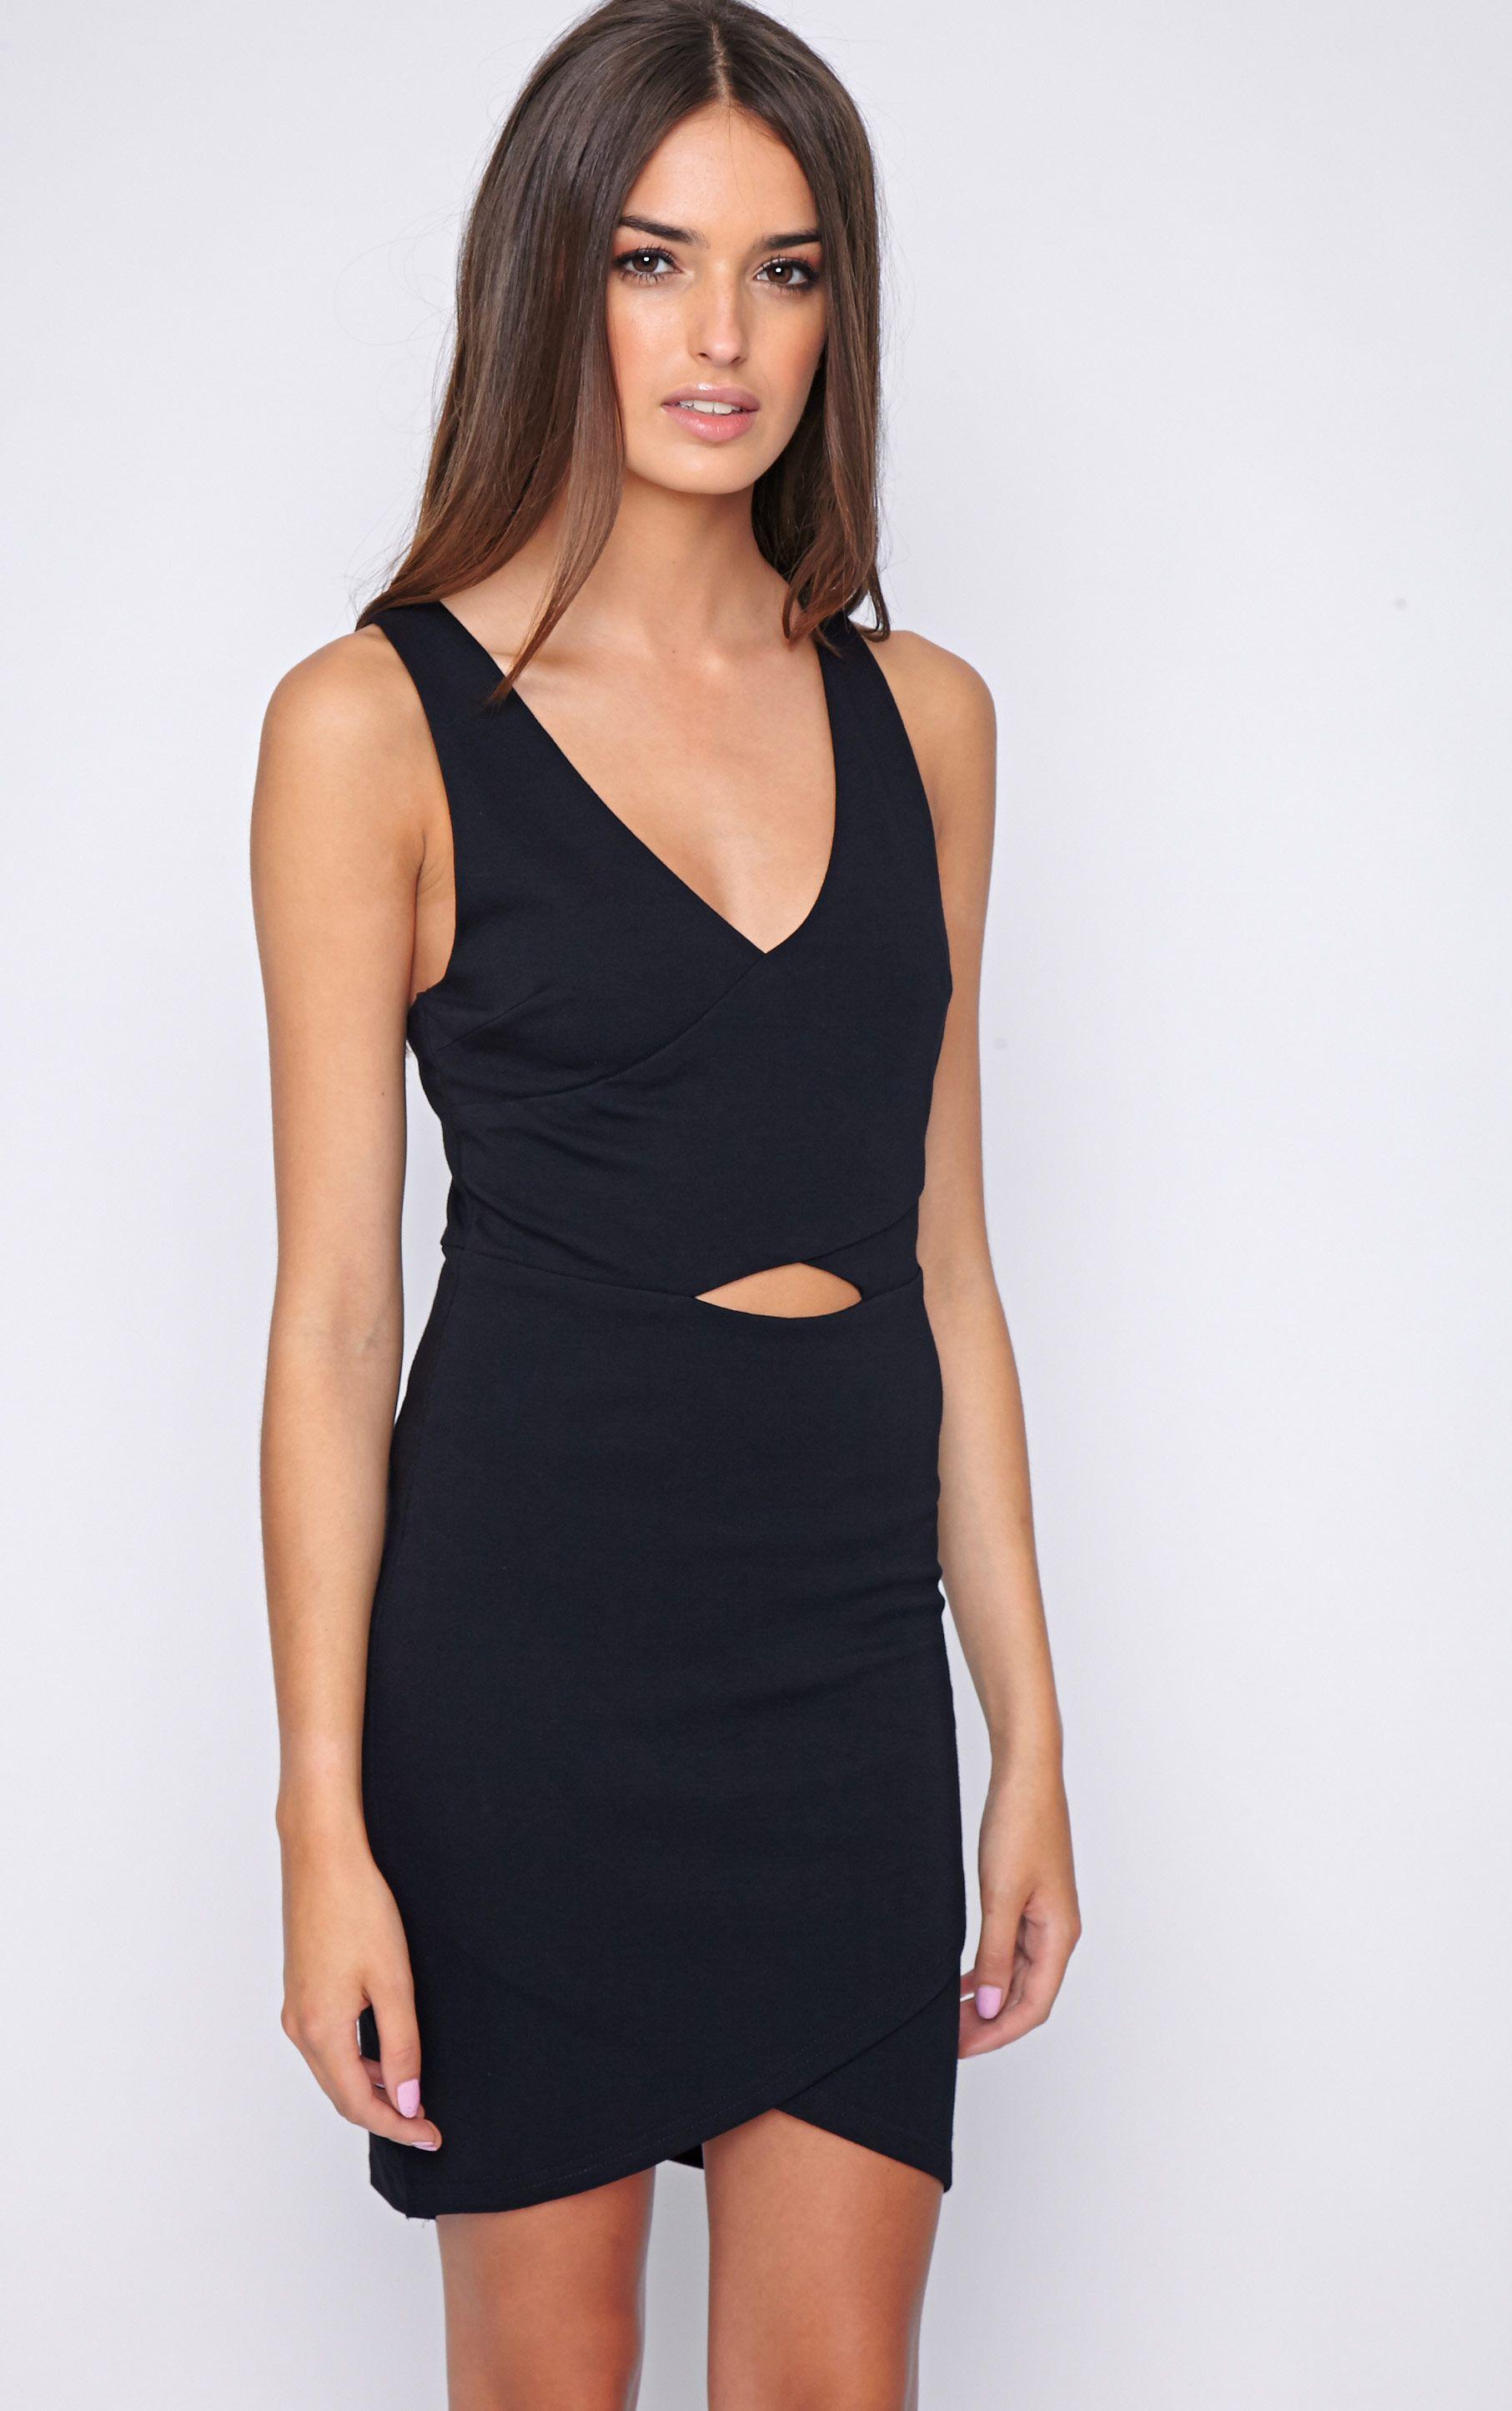 Tulsi Black Crossover Mini Dress 1